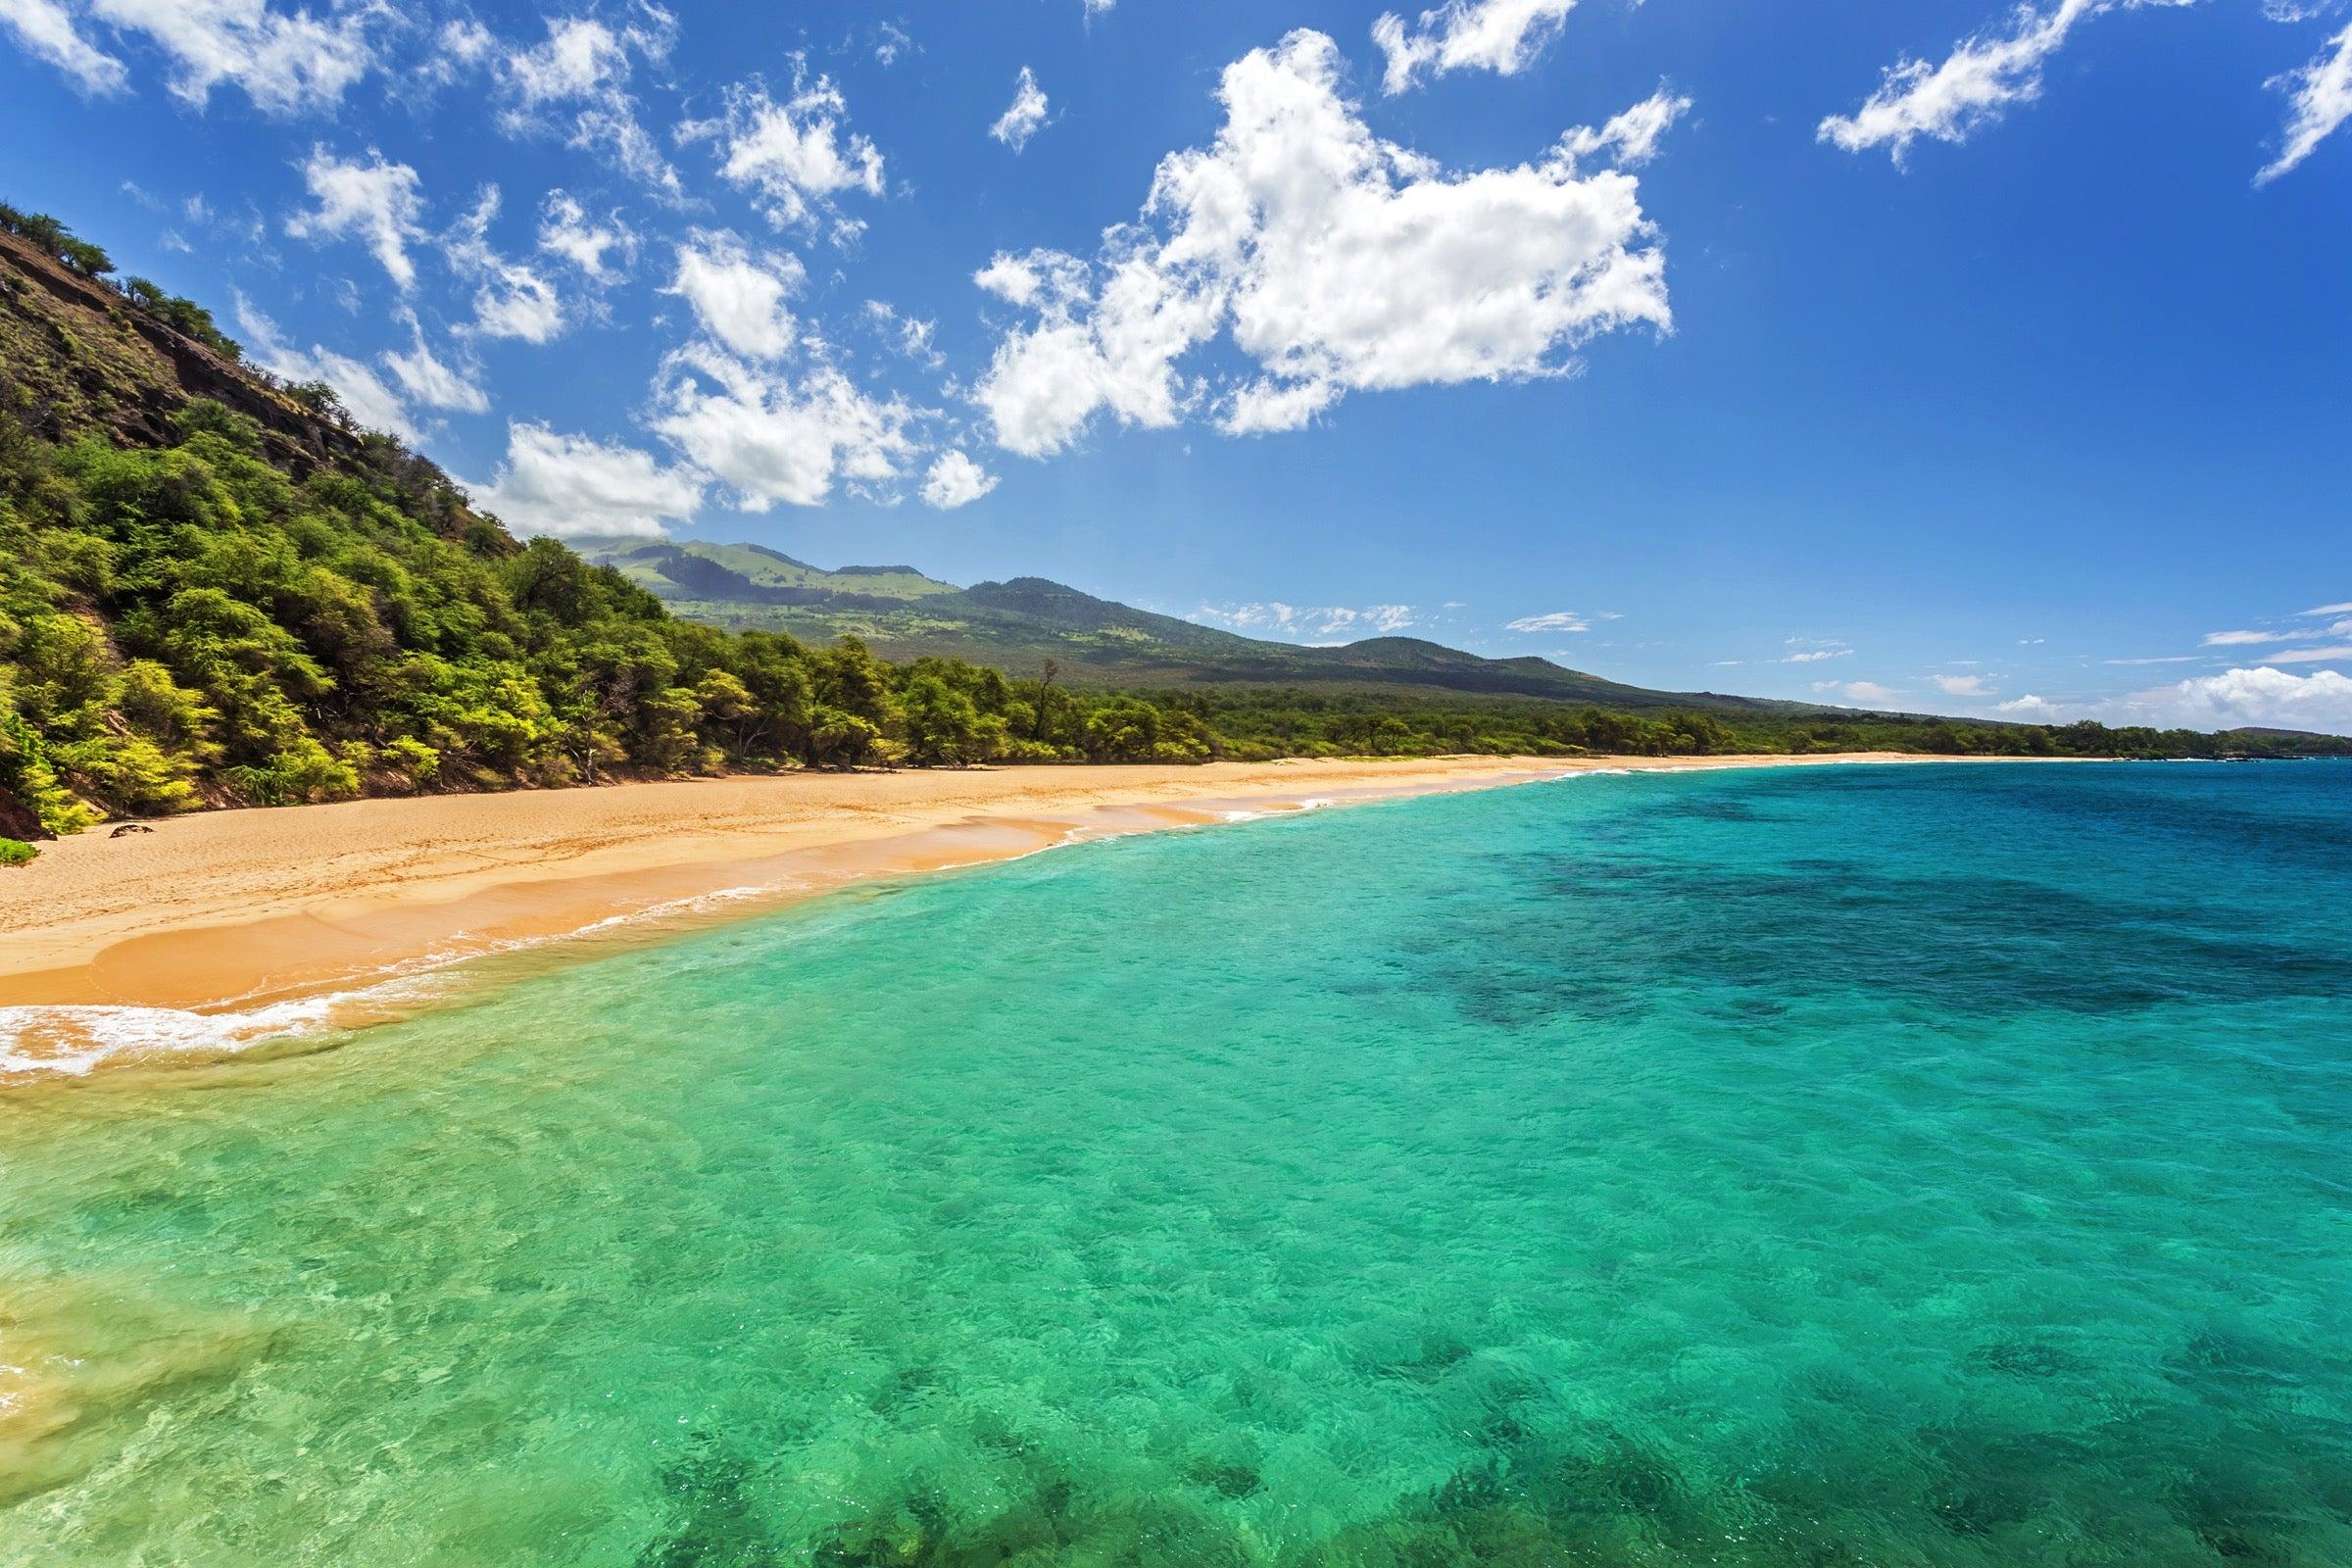 Maui's answer to the car rental shortage: The $50 per person Maui ALOHA Shuttle